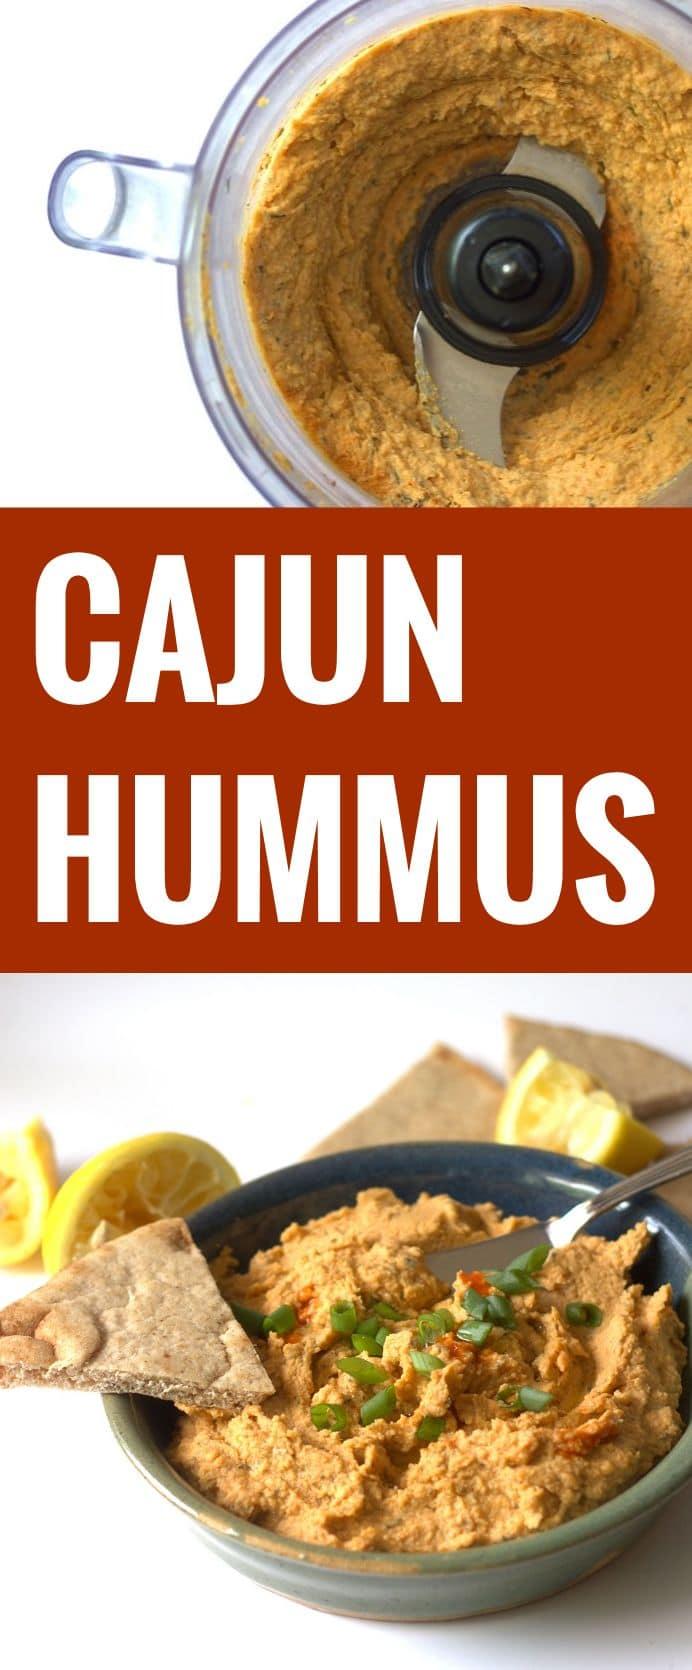 Cajun Hummus